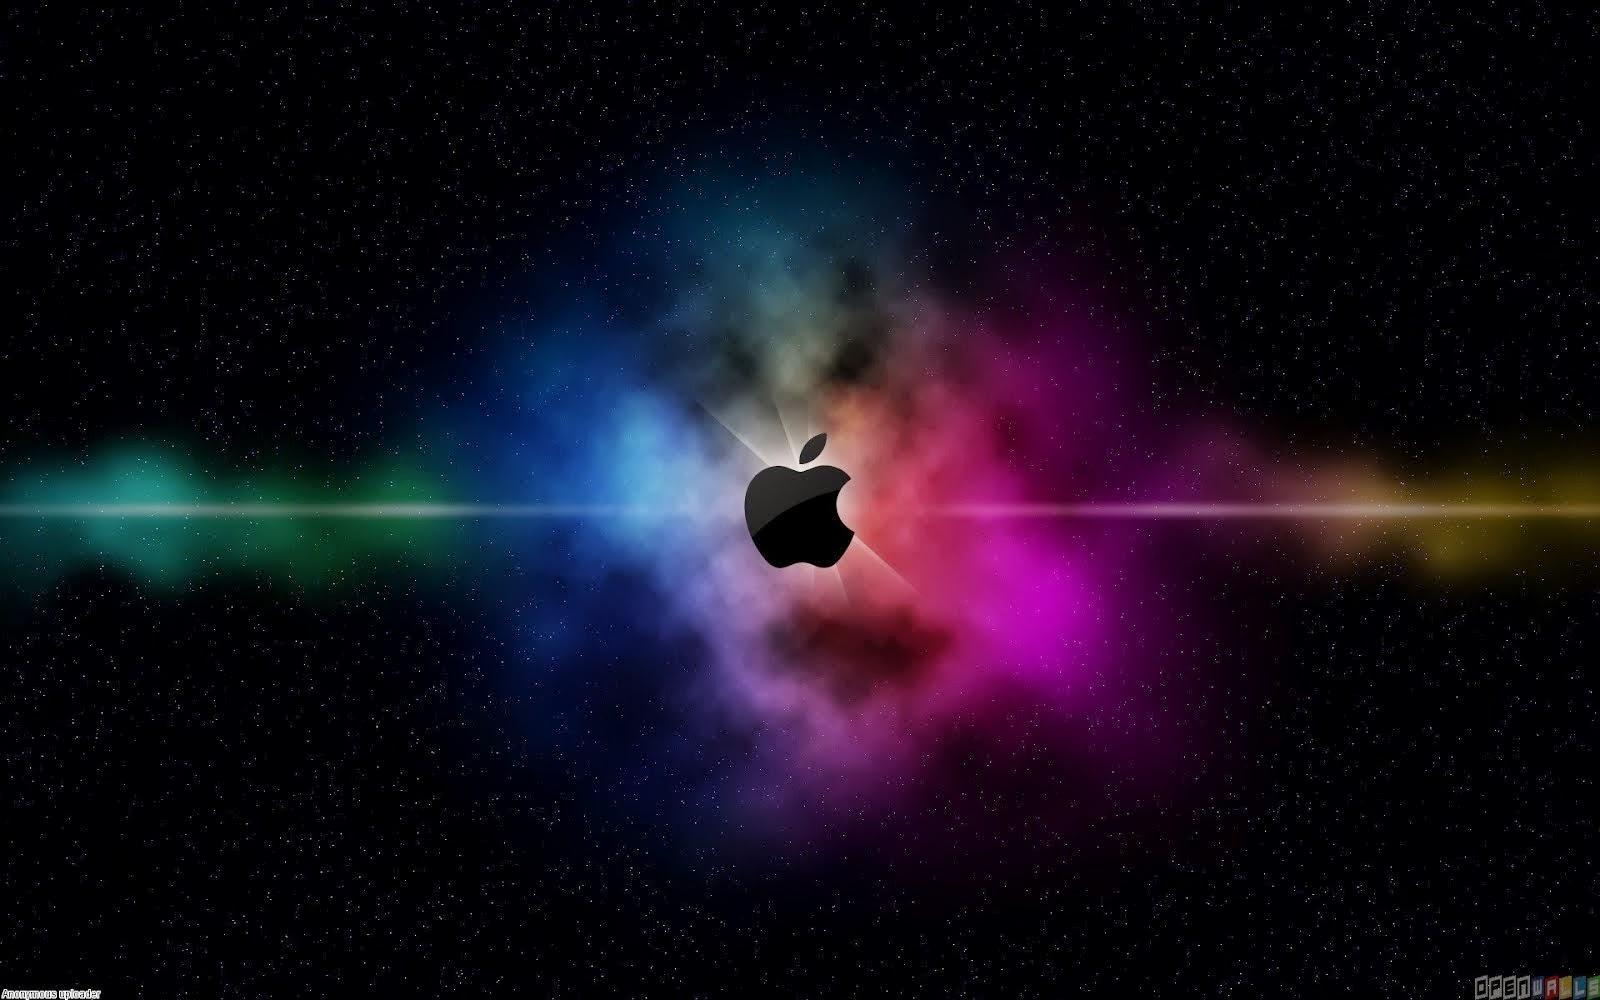 Apple Space Wallpaper | Space Wallpaper